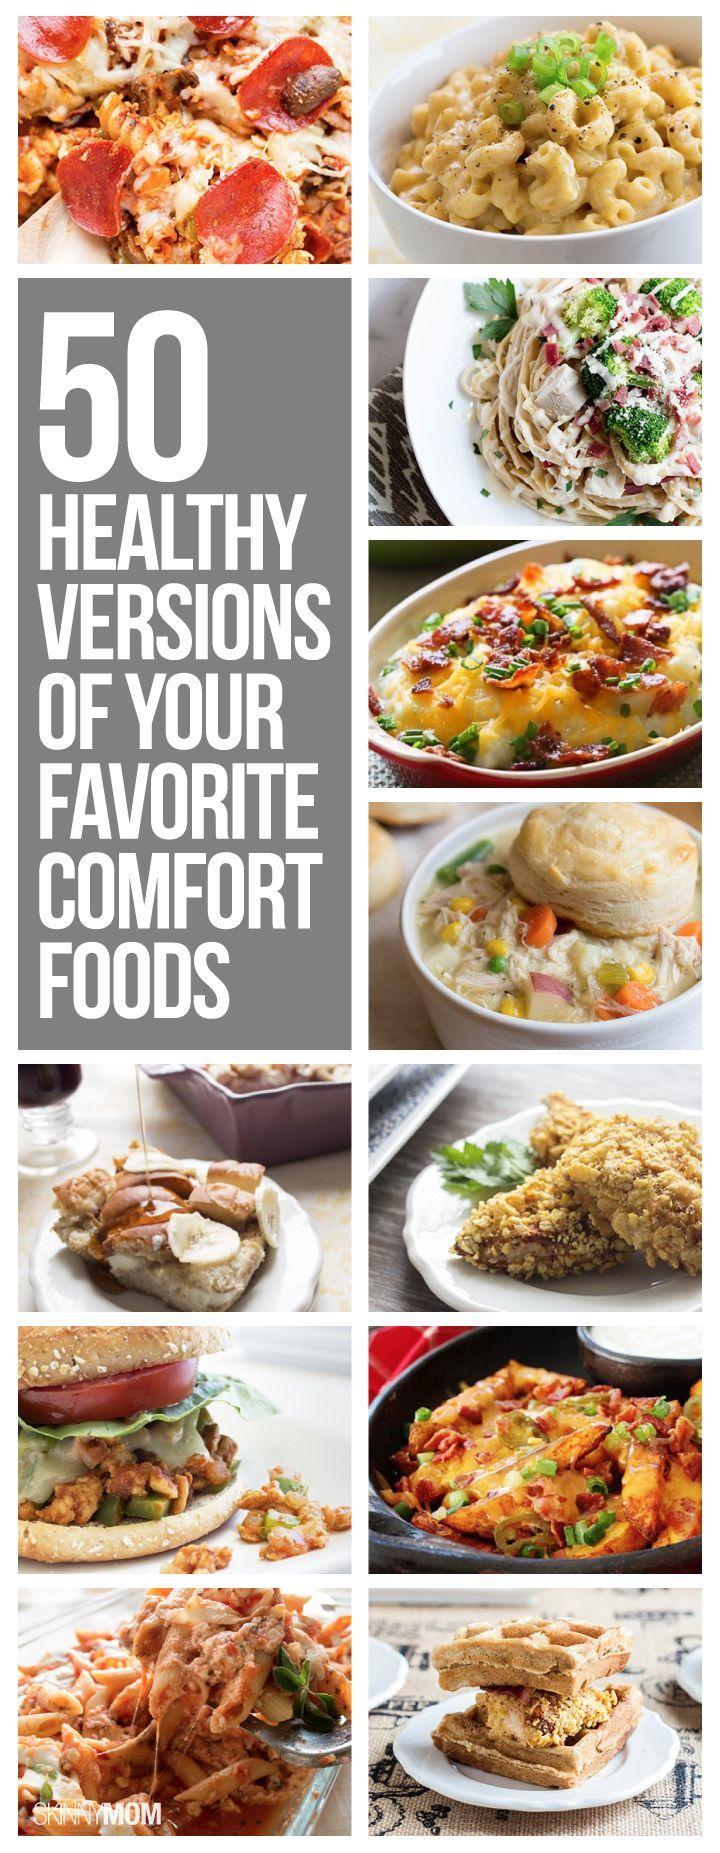 50 of the best ever comfort foods got a healthy makeover junk love junk food enjoy these healthier meals for your fave comfort foods forumfinder Images